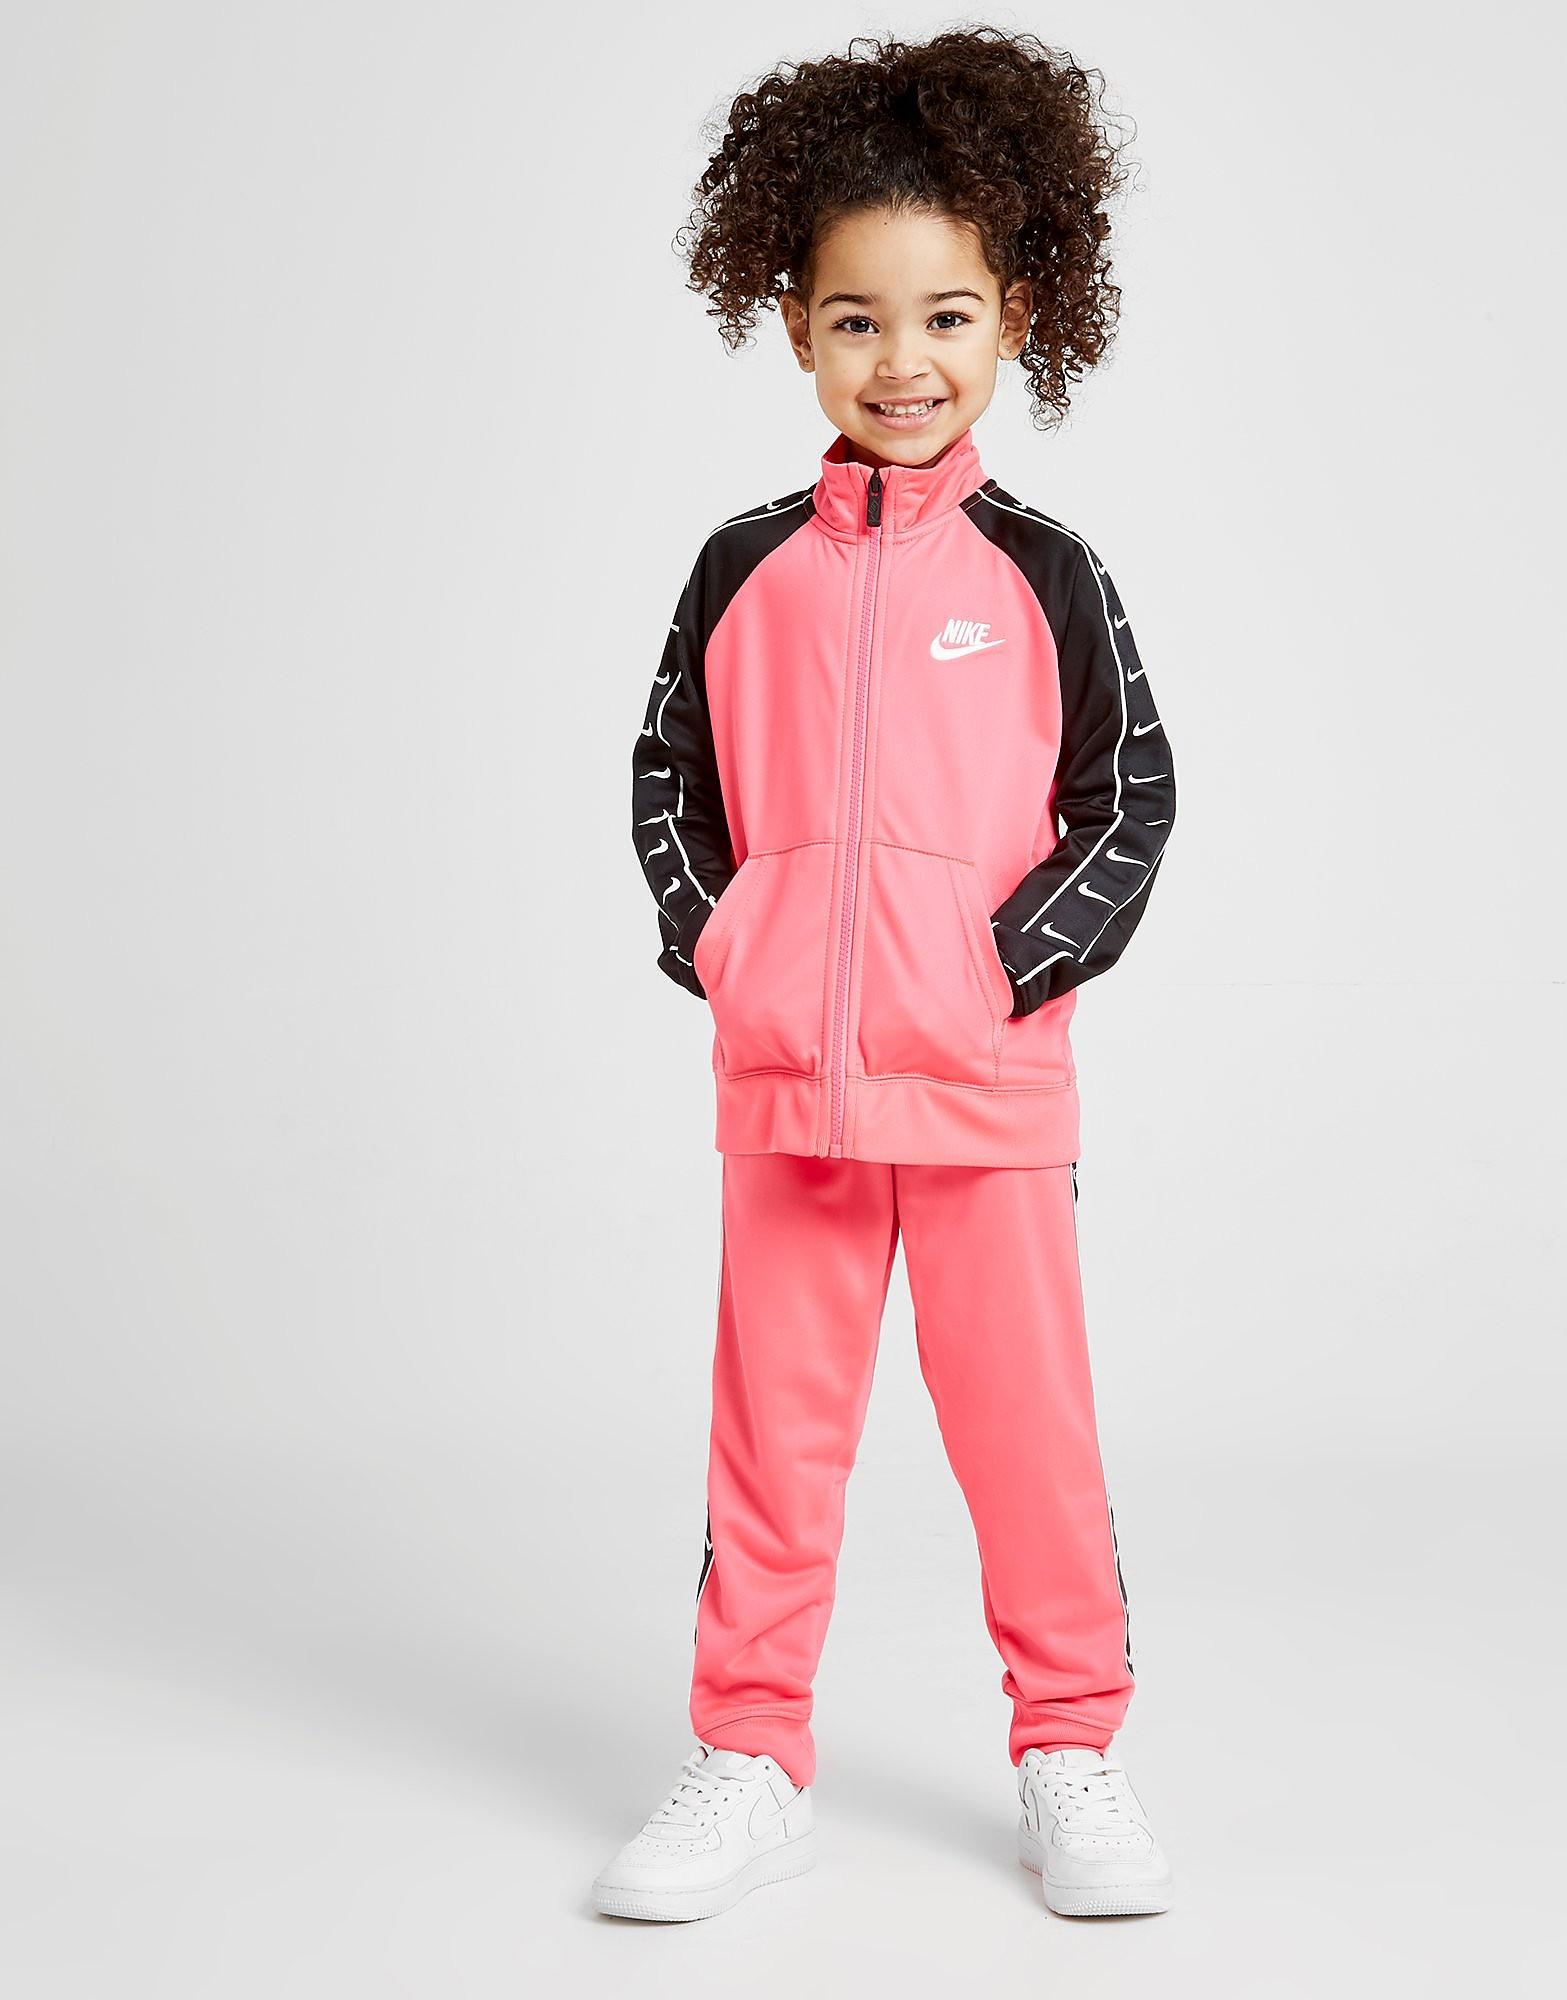 Nike Girls Swoosh Tape Trainingspak Kinderen Roze Kind Roze